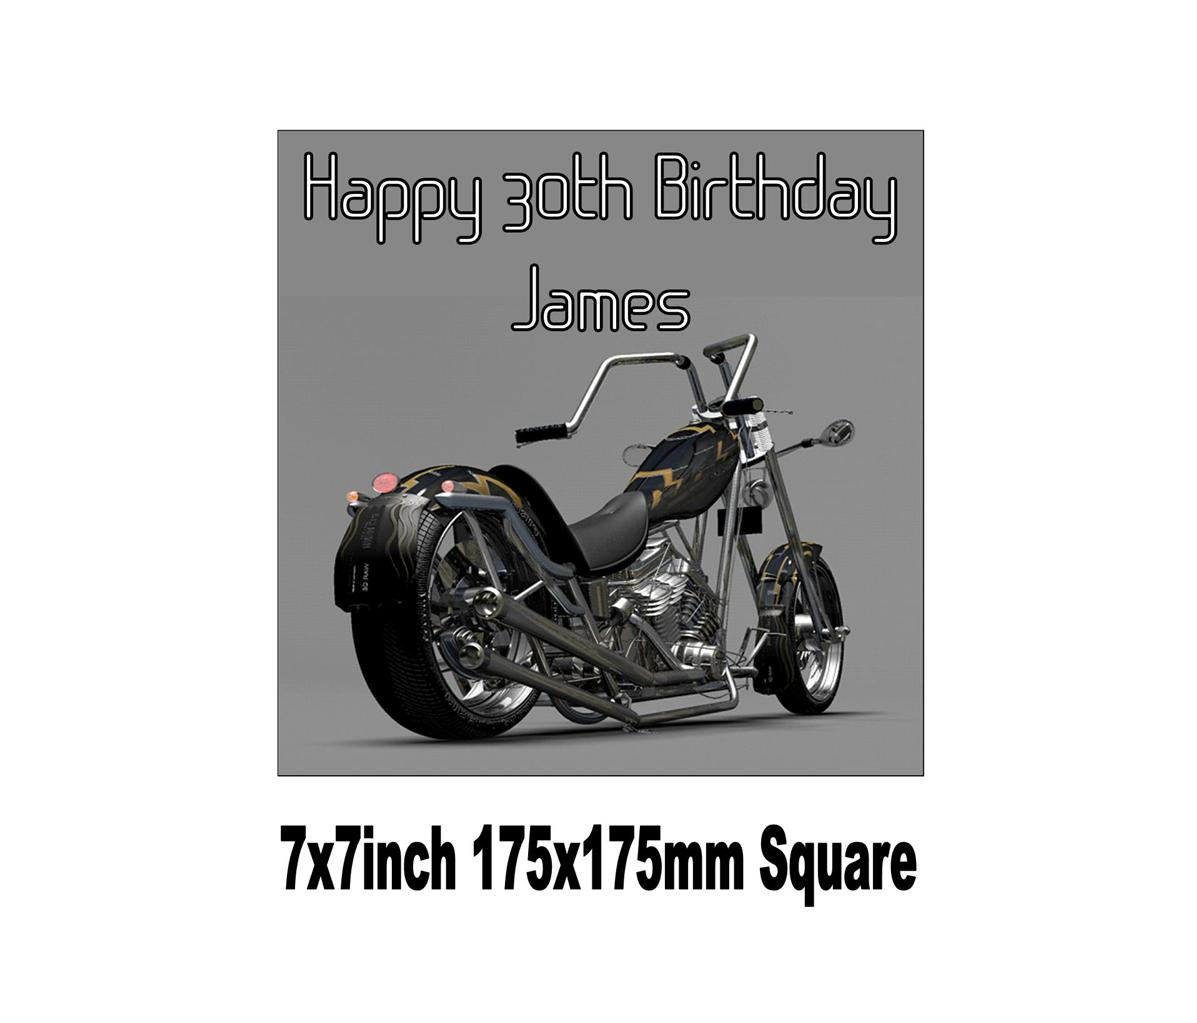 Harley Davidson Chopper Motorbike Birthday Cake Topperchoices